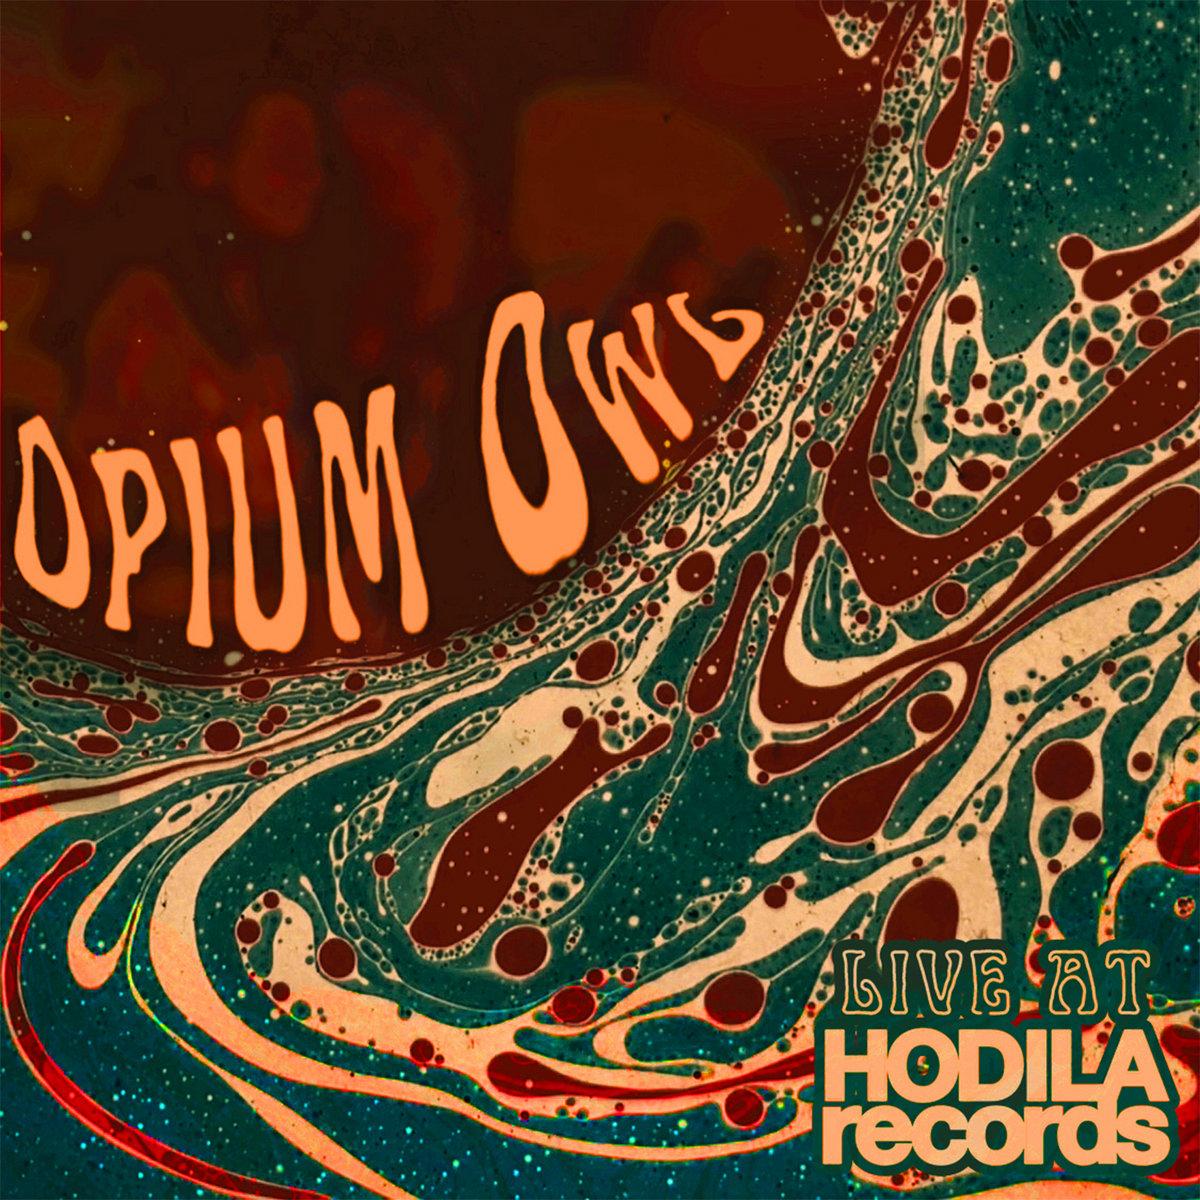 Opium Owl Live at Hodila Records